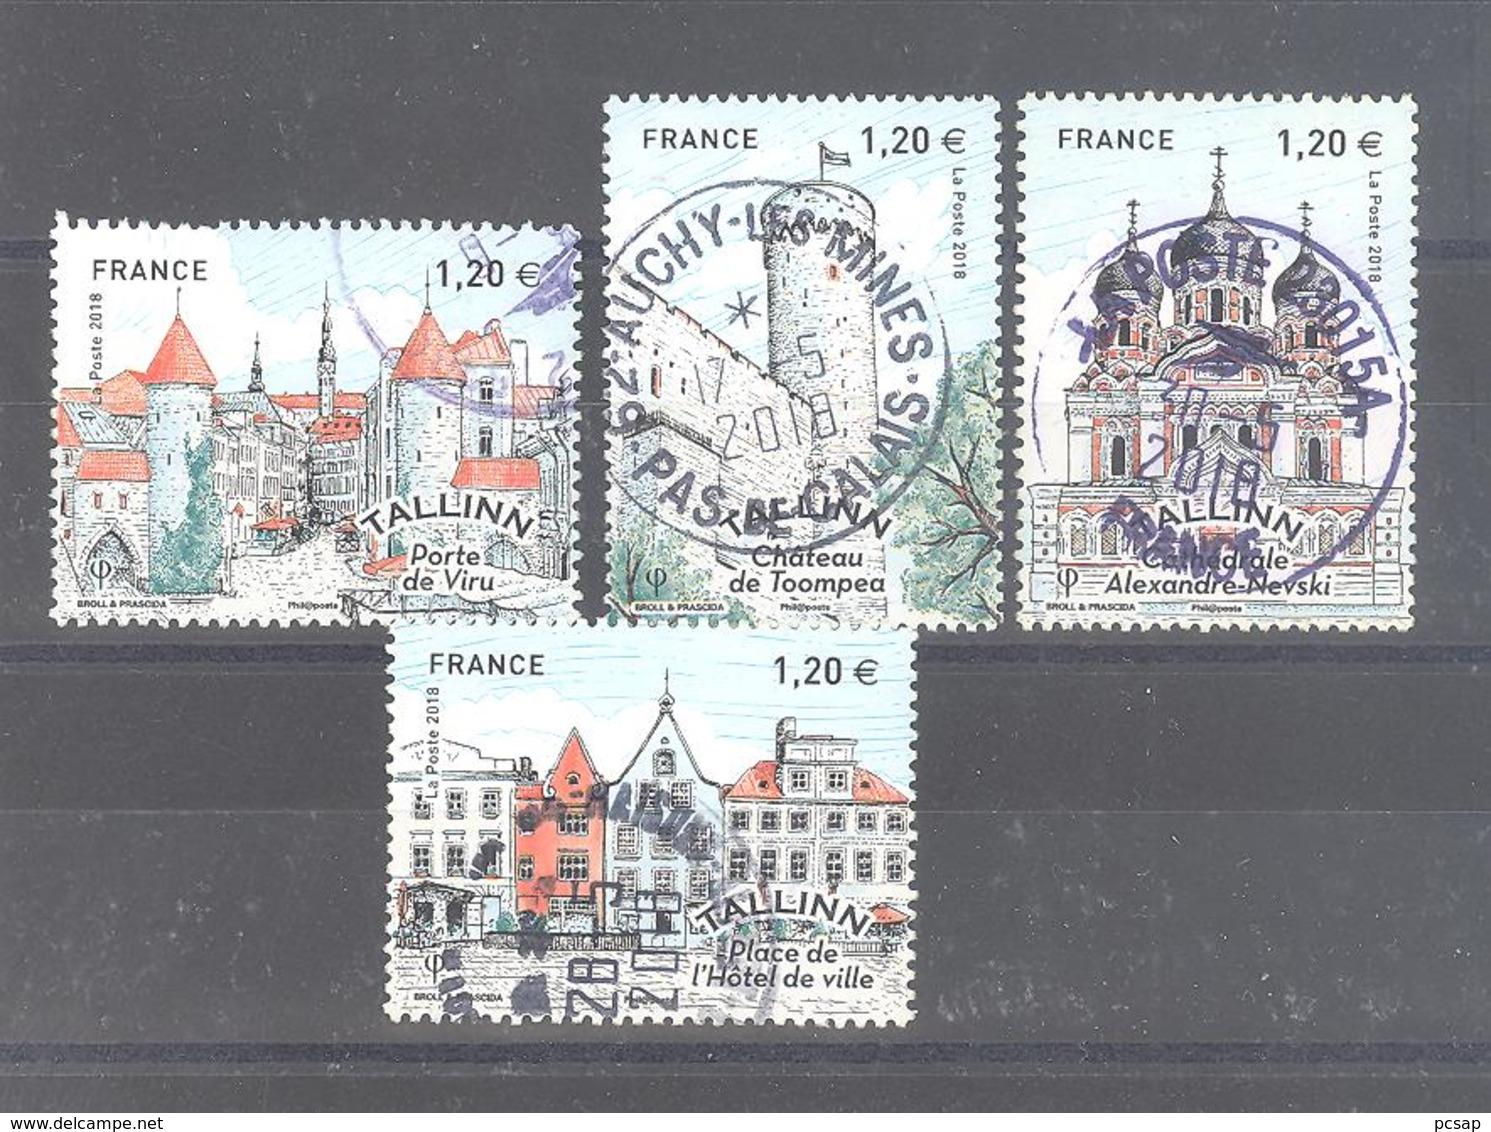 "France Oblitérés : Les 4 Timbres Du Bloc ""Tallinn - Estonie"" (cachet Rond) - France"